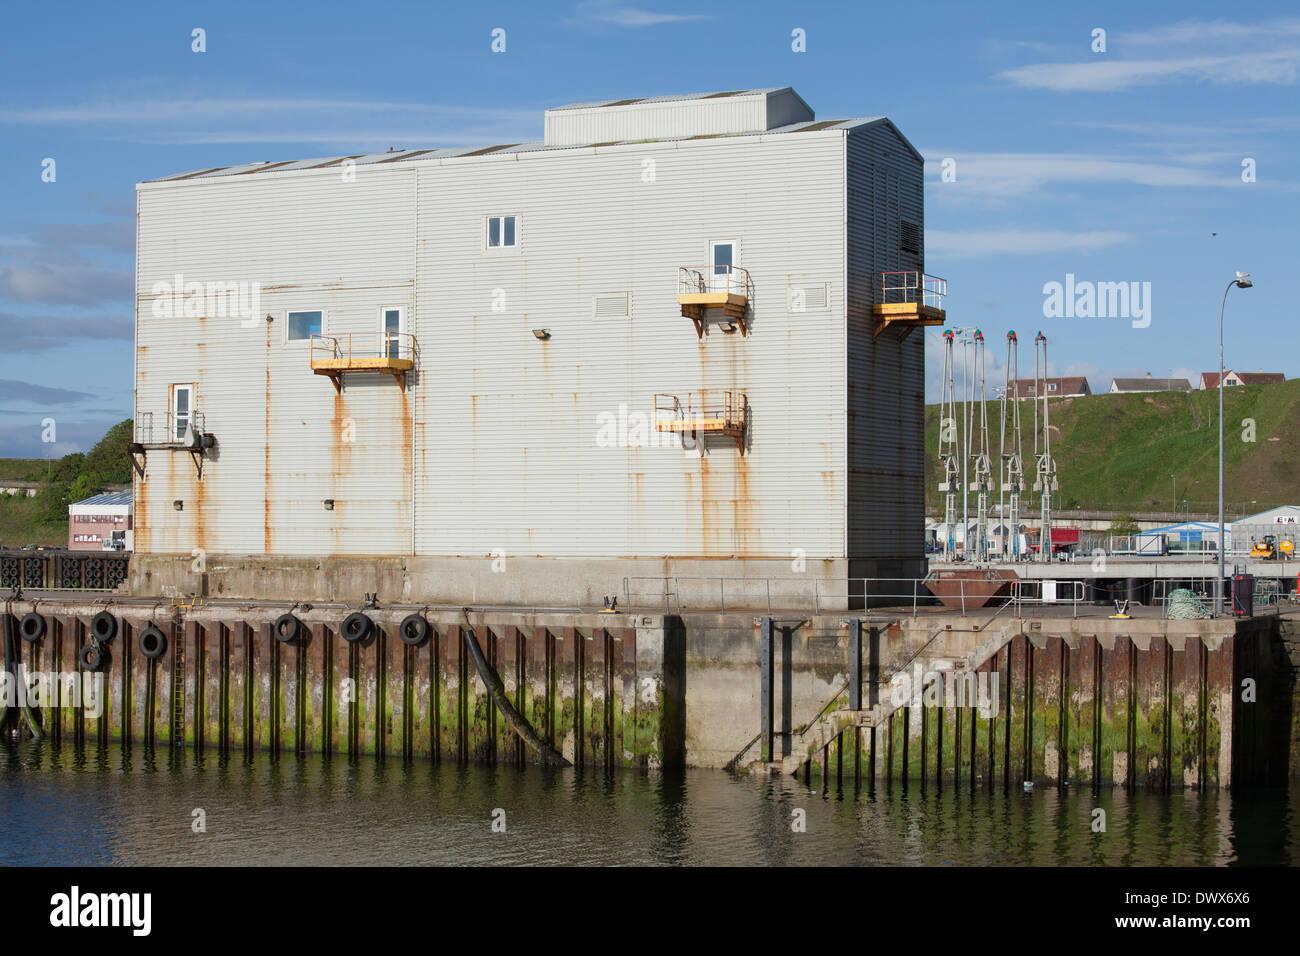 Scrabster Harbour, Scrabster, Thurso, Caithness, Scotland - Stock Image